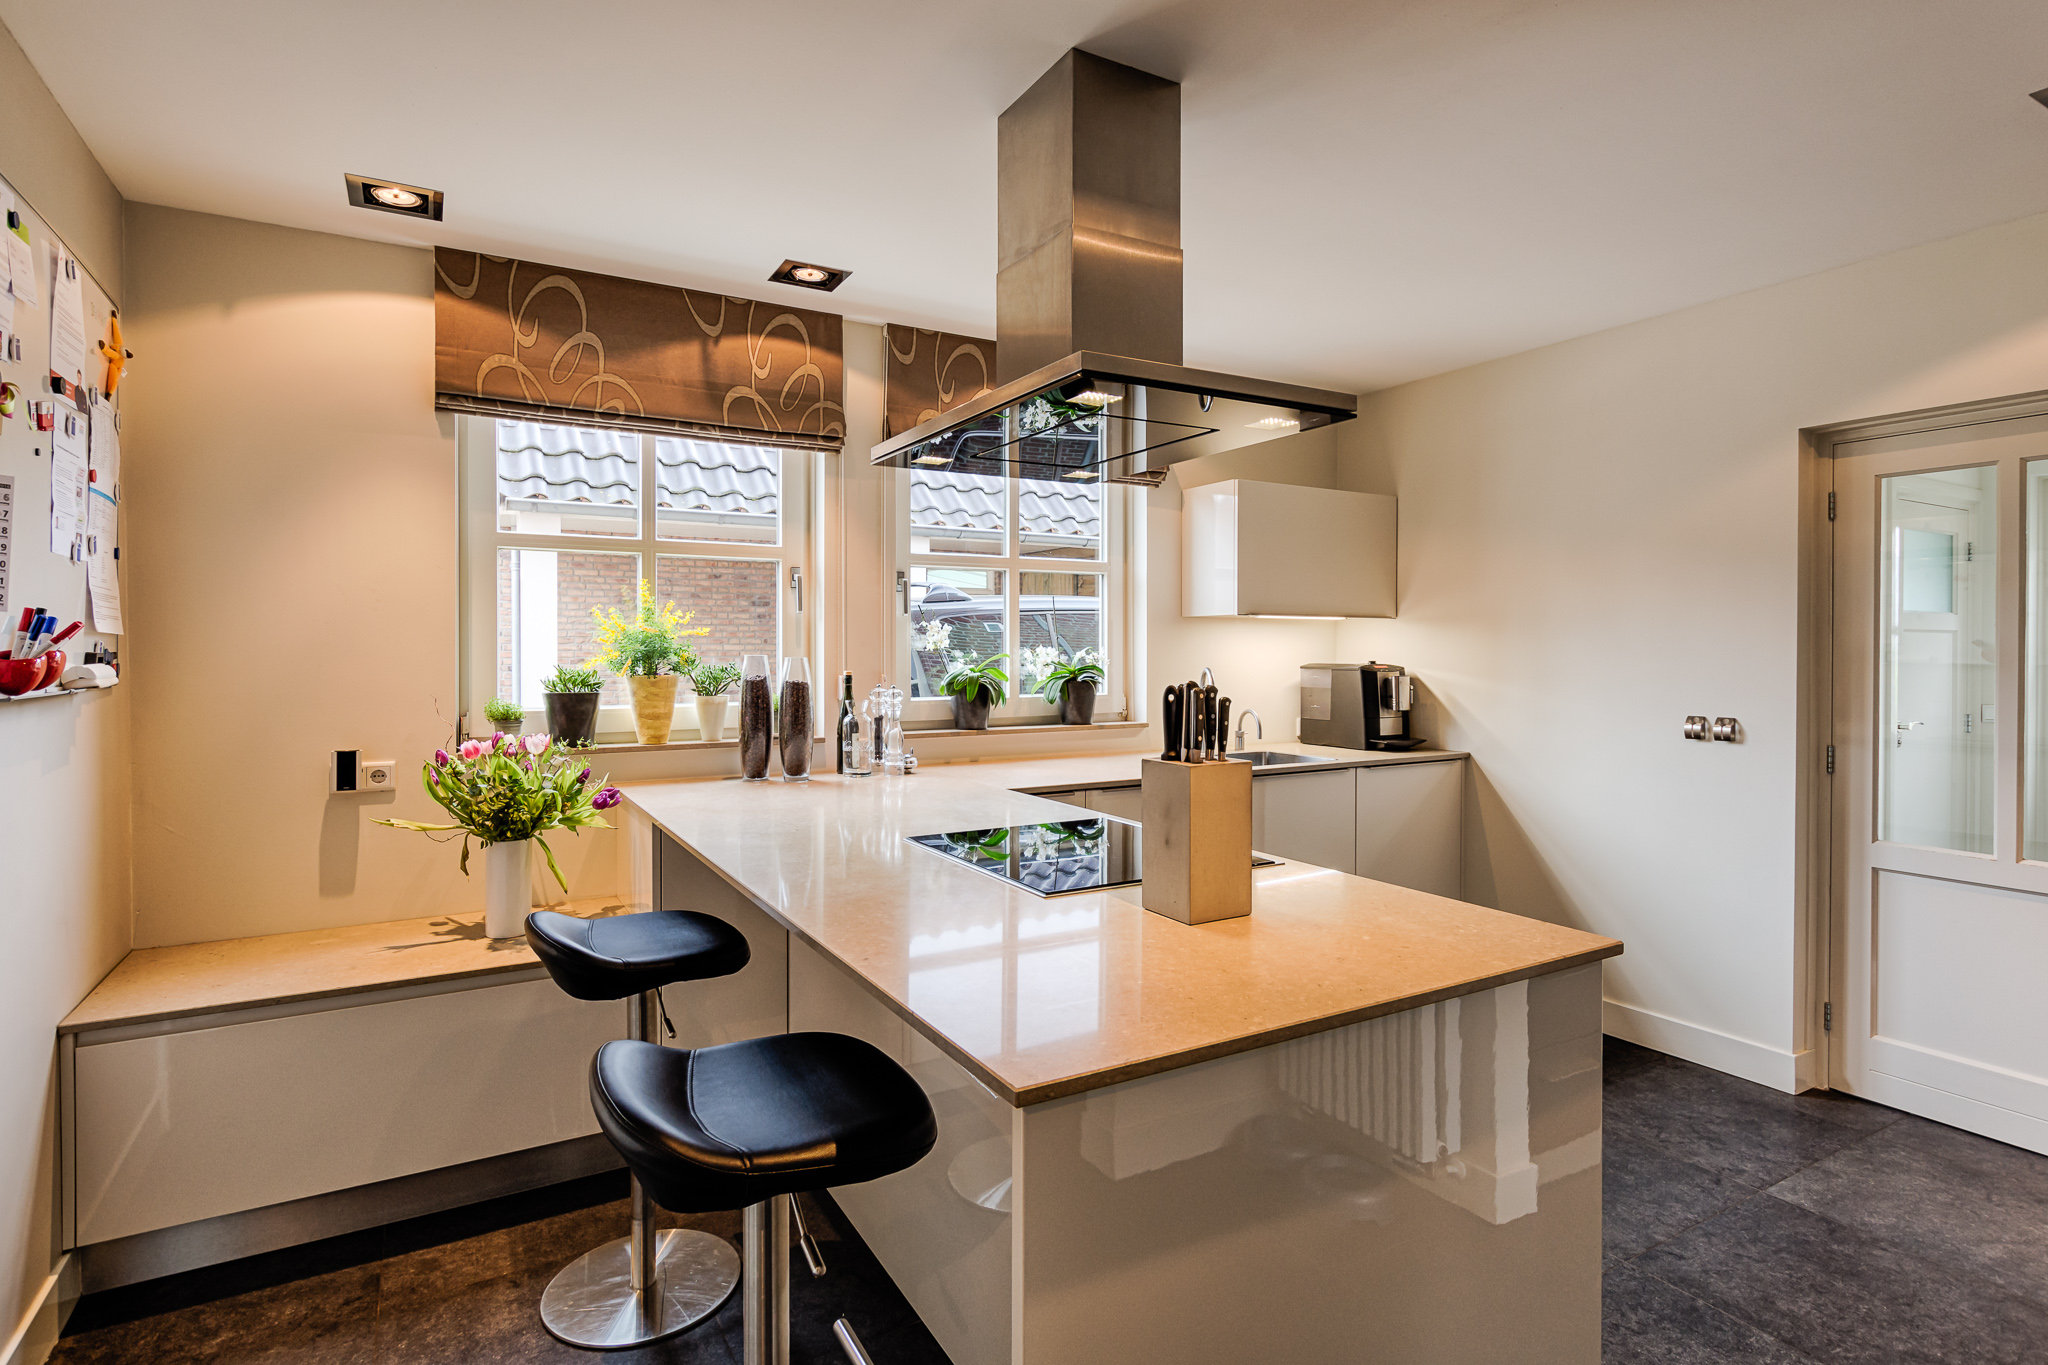 Home Design Keukens : Design keuken forest keukens